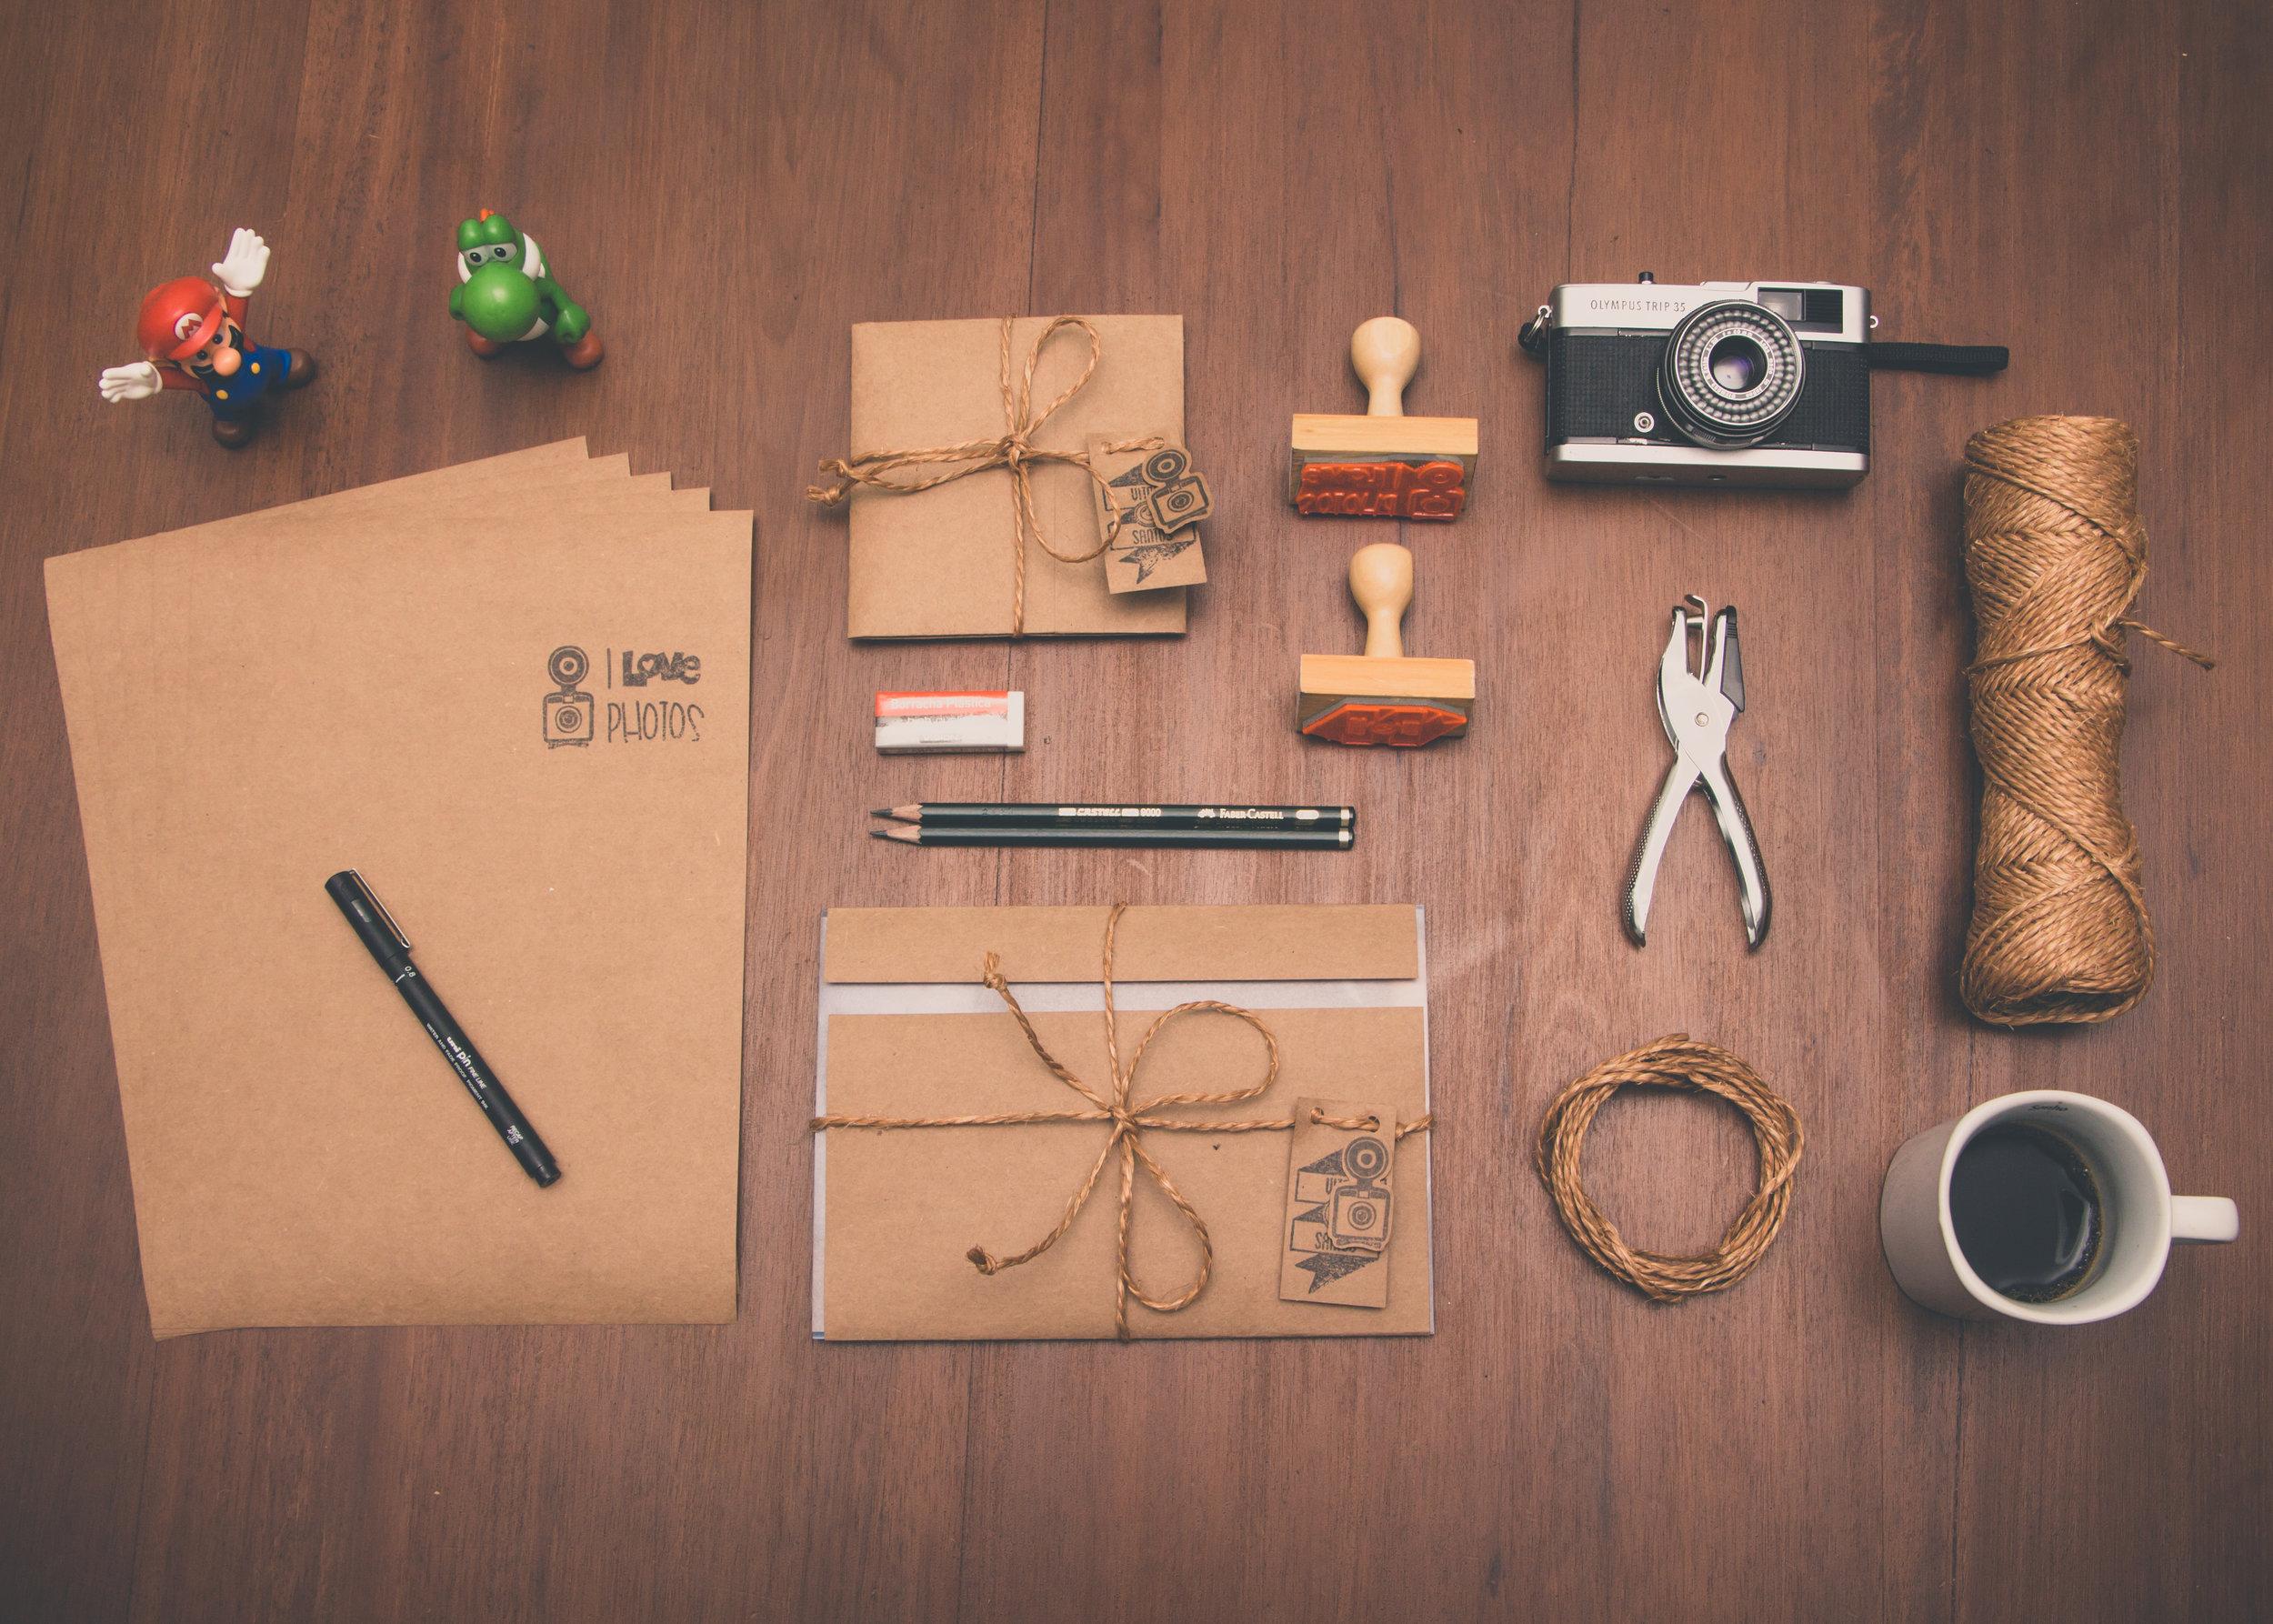 Foto:  Vitor Santos  für www.unsplash.com